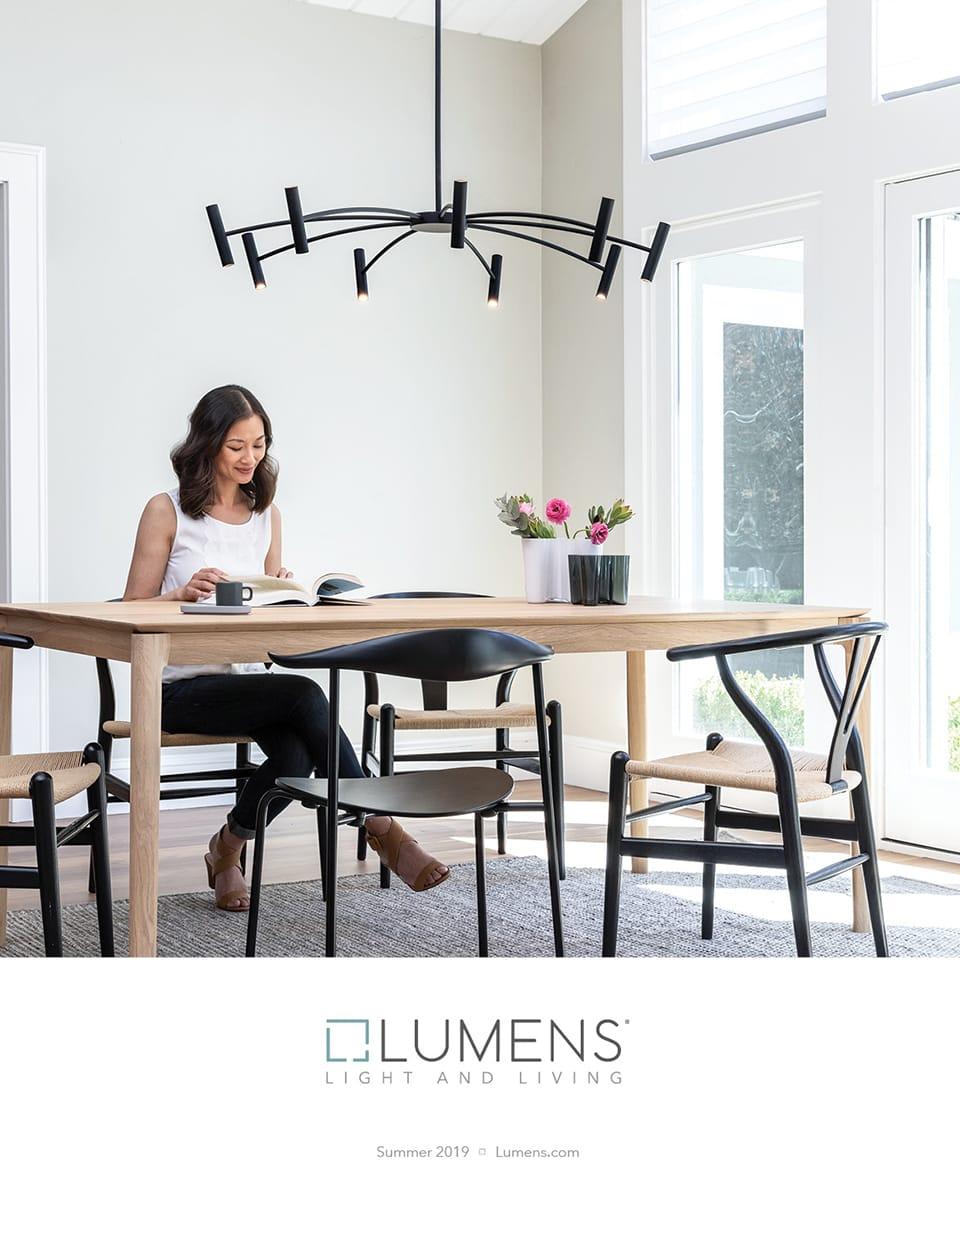 View the Lumens 2019 Summer eCatalog